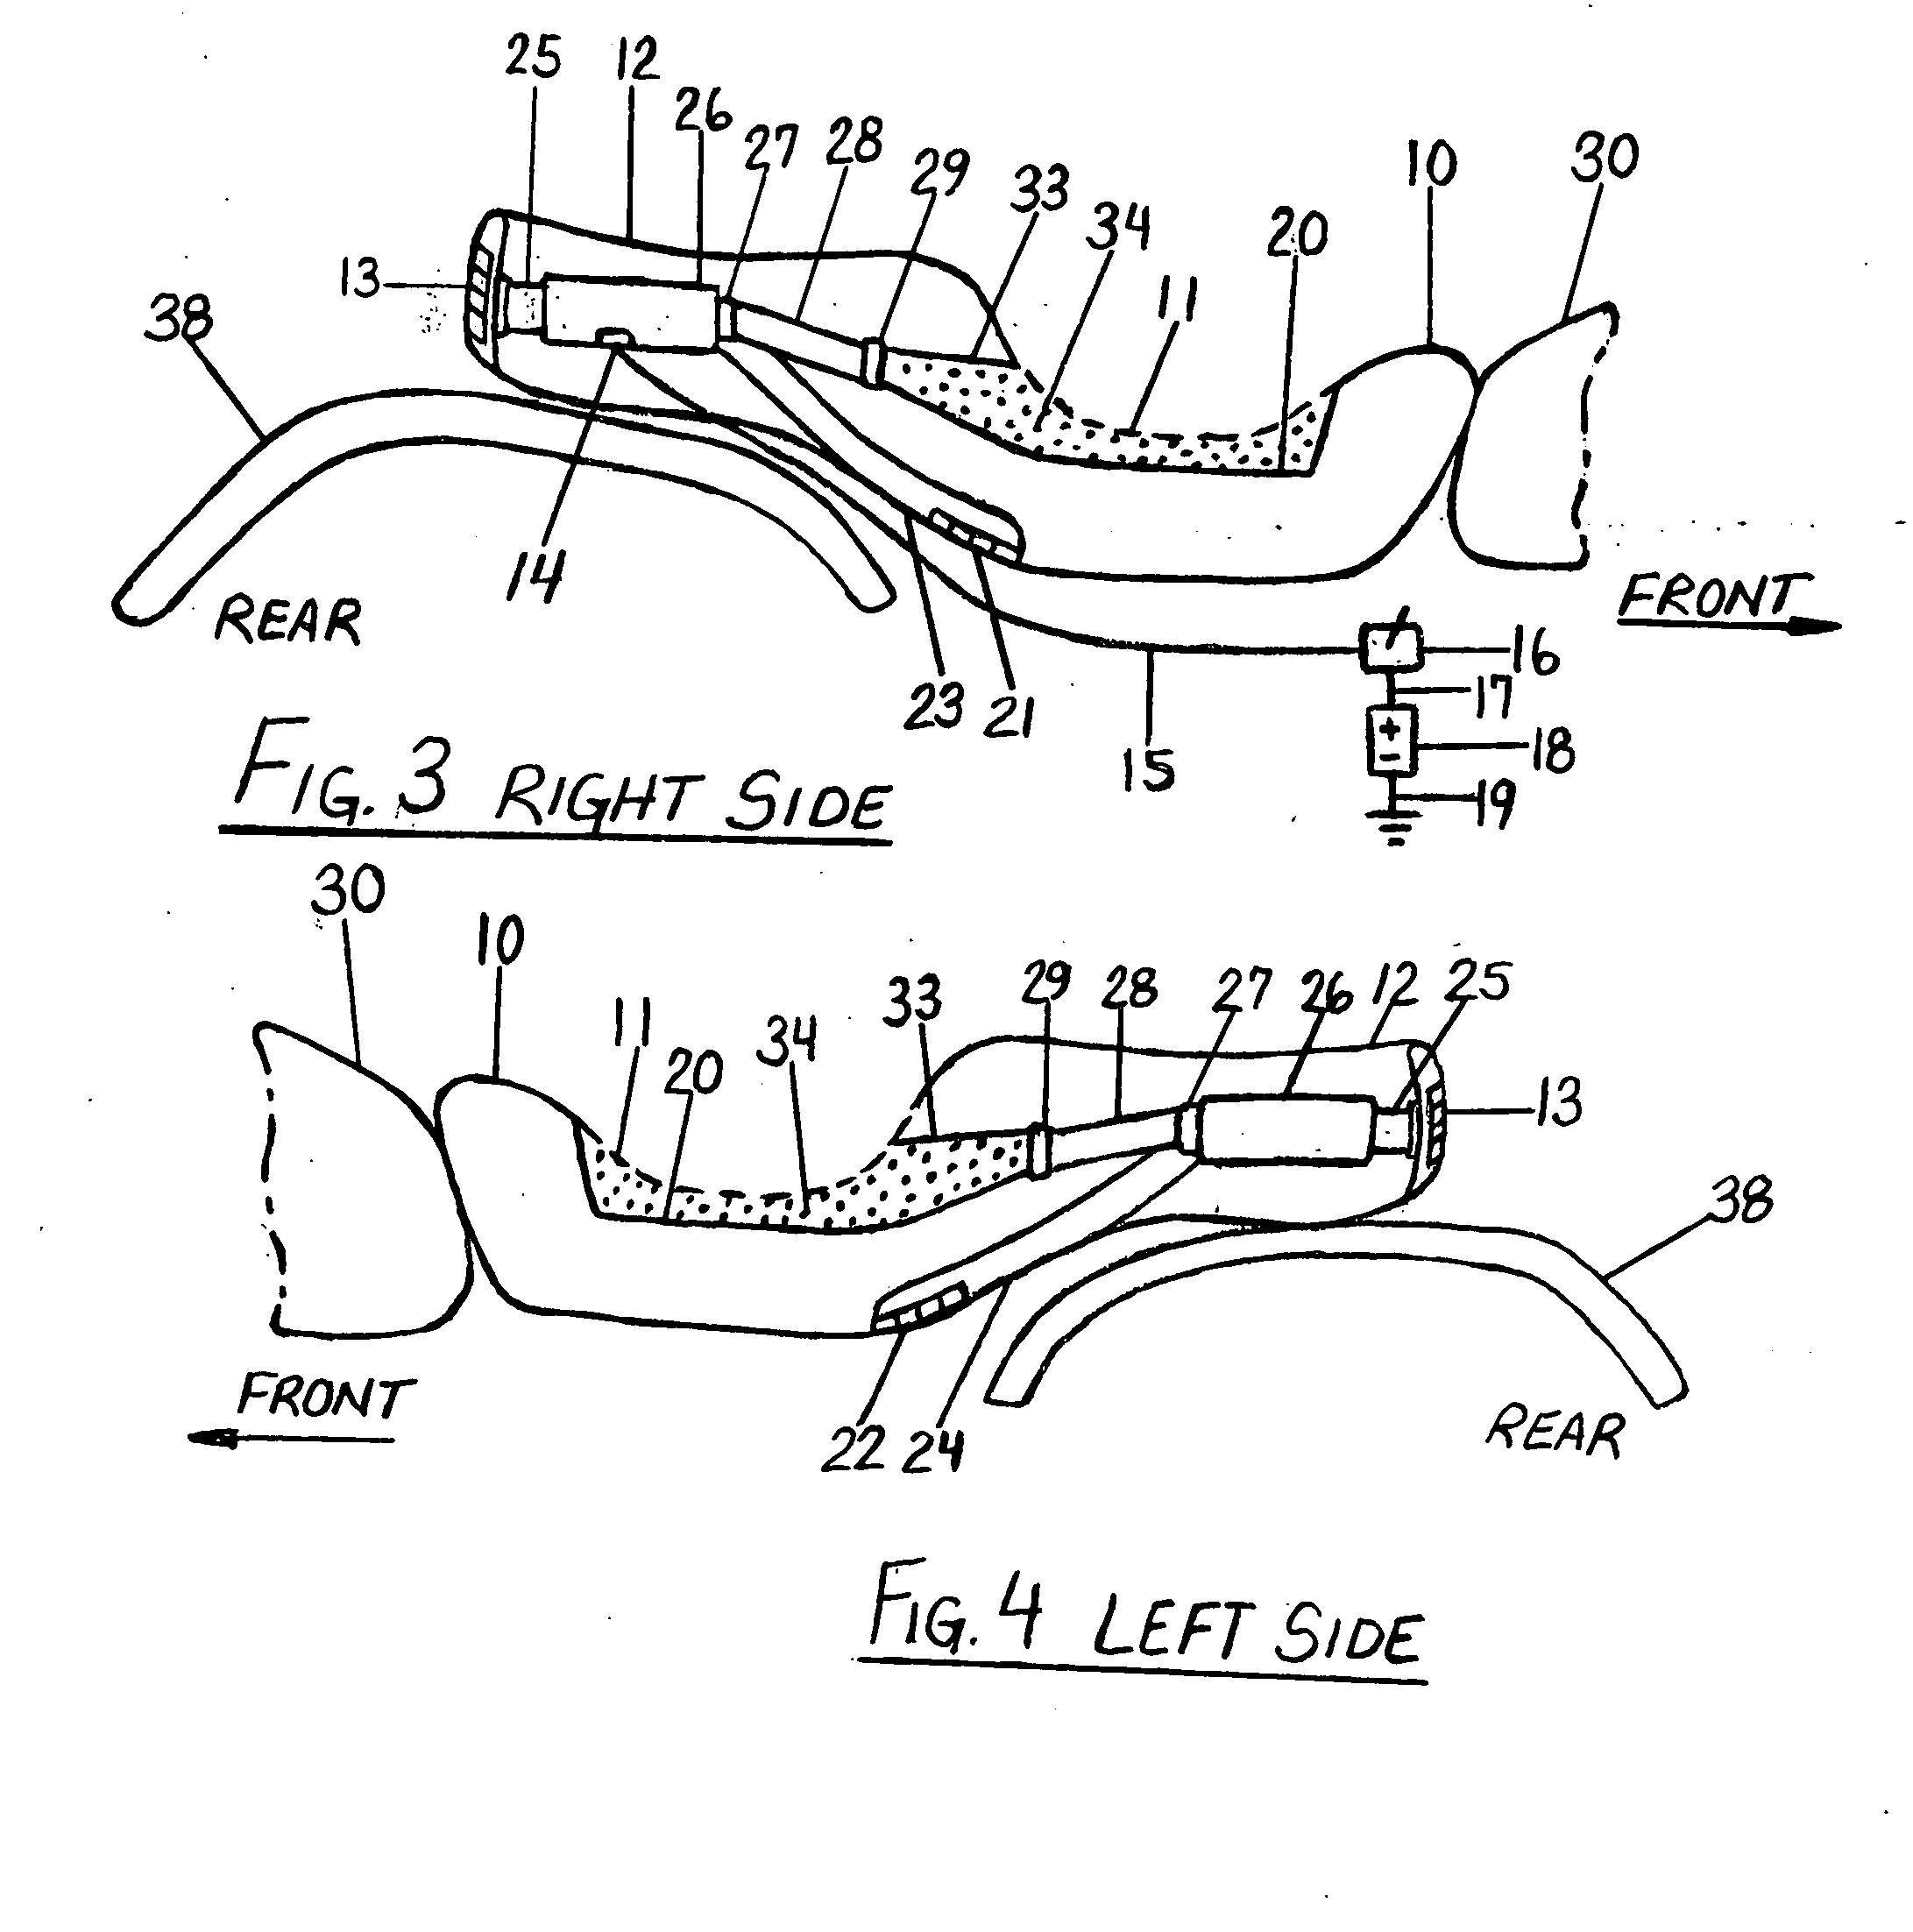 harley davidson motorcycles parts diagram fuel tank html